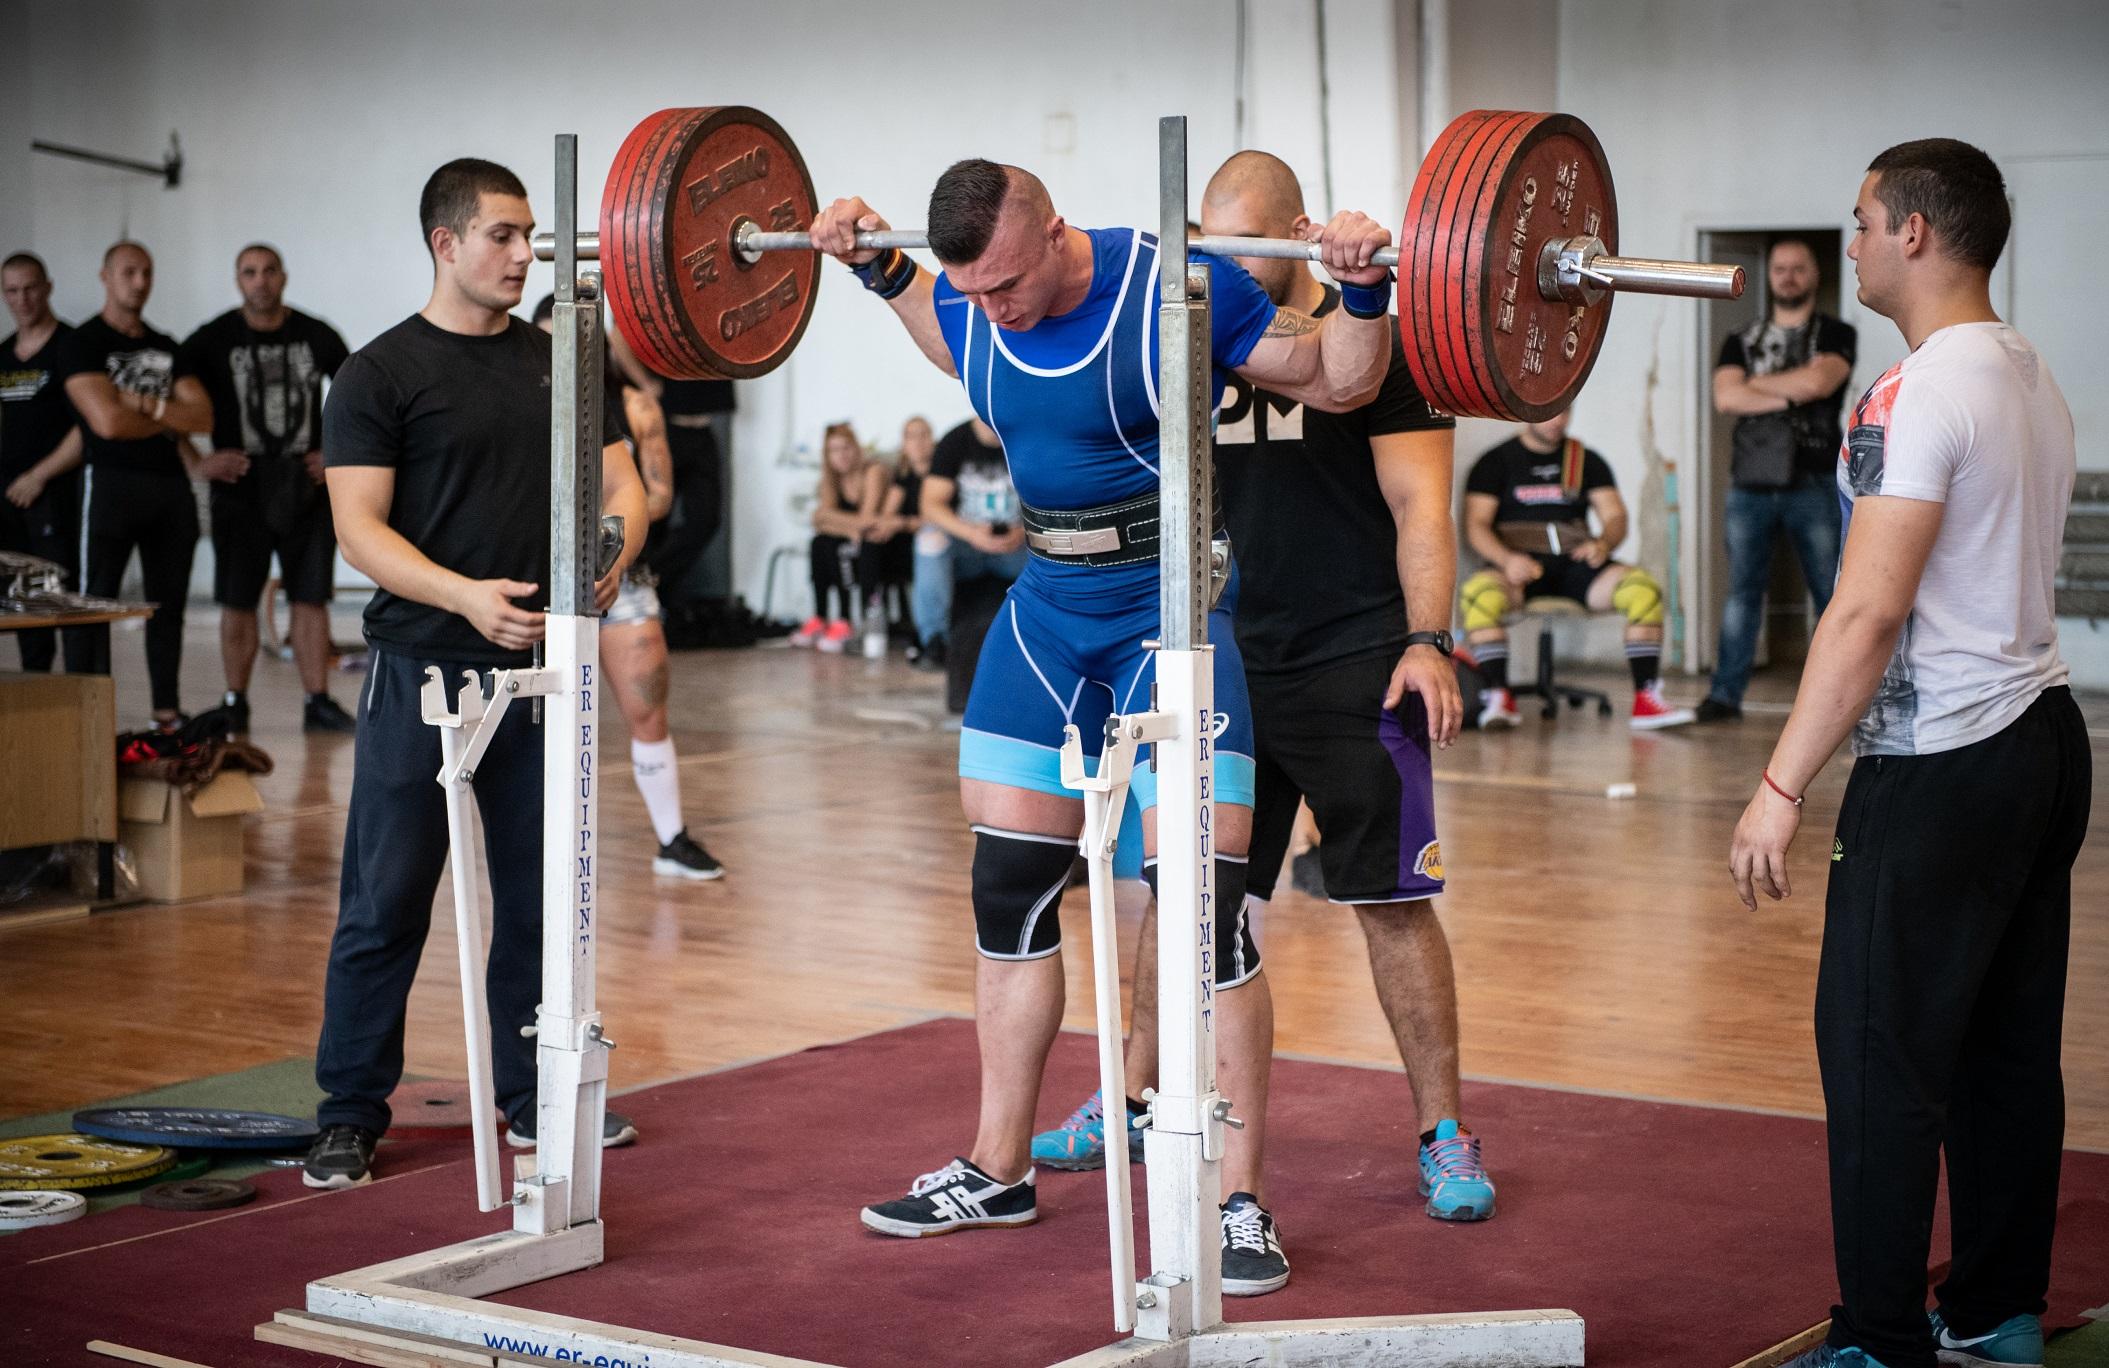 Squats hamstring muscles